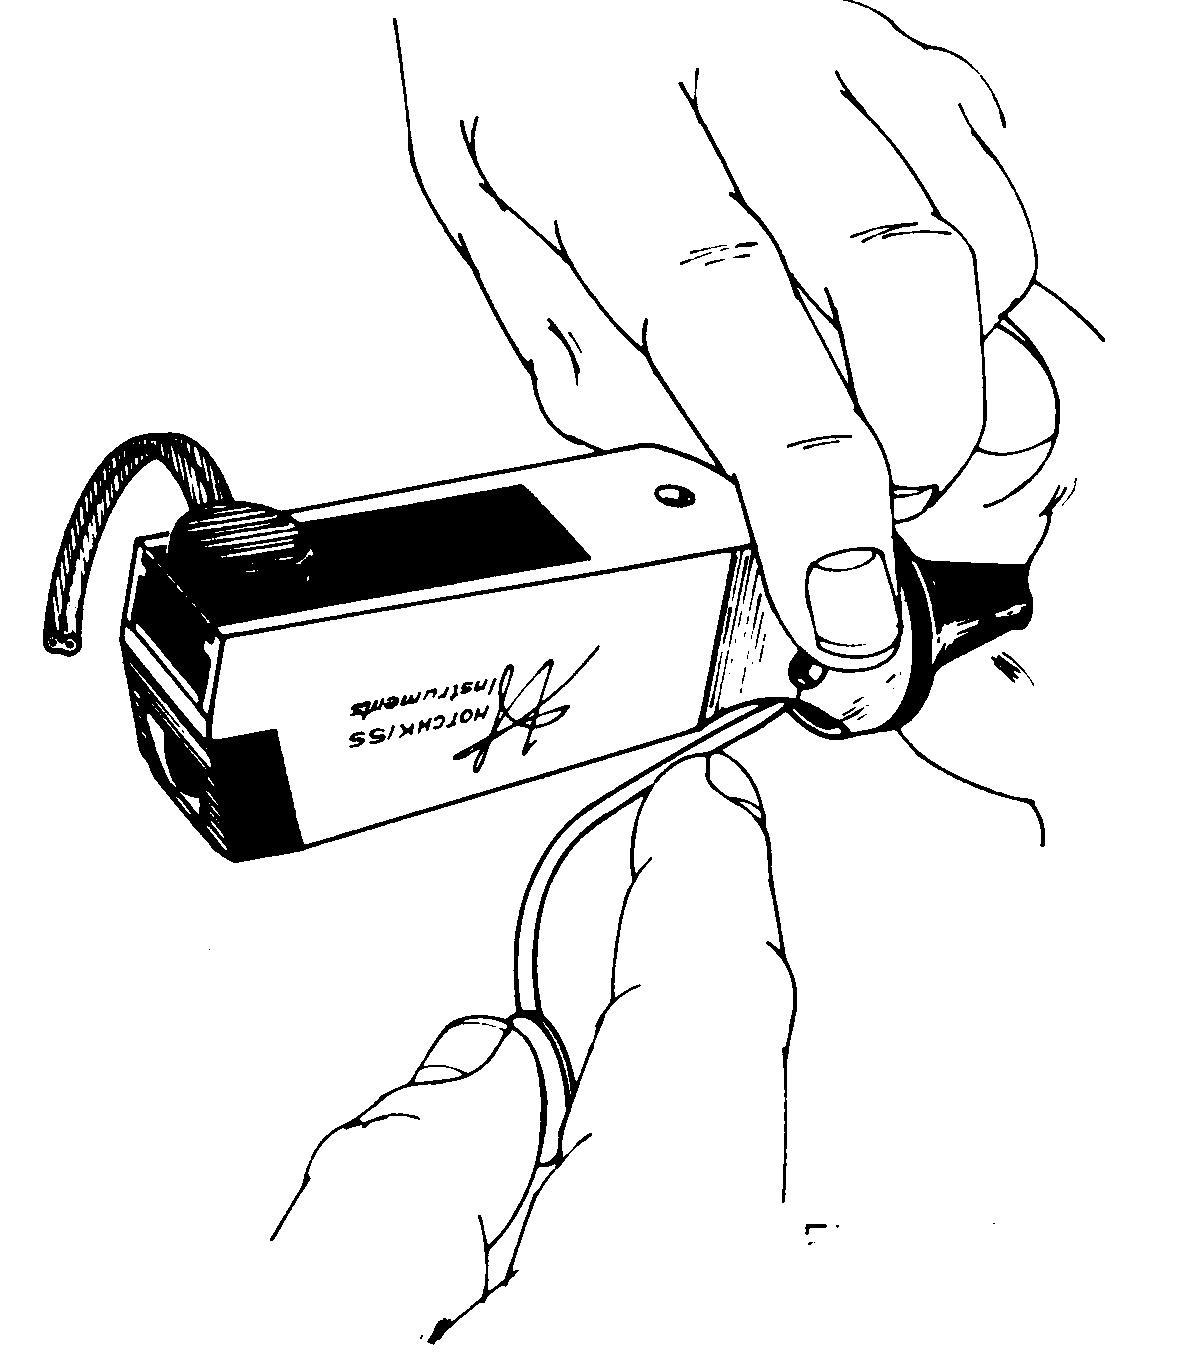 hotchkiss-instructions-figure-9-001.jpg